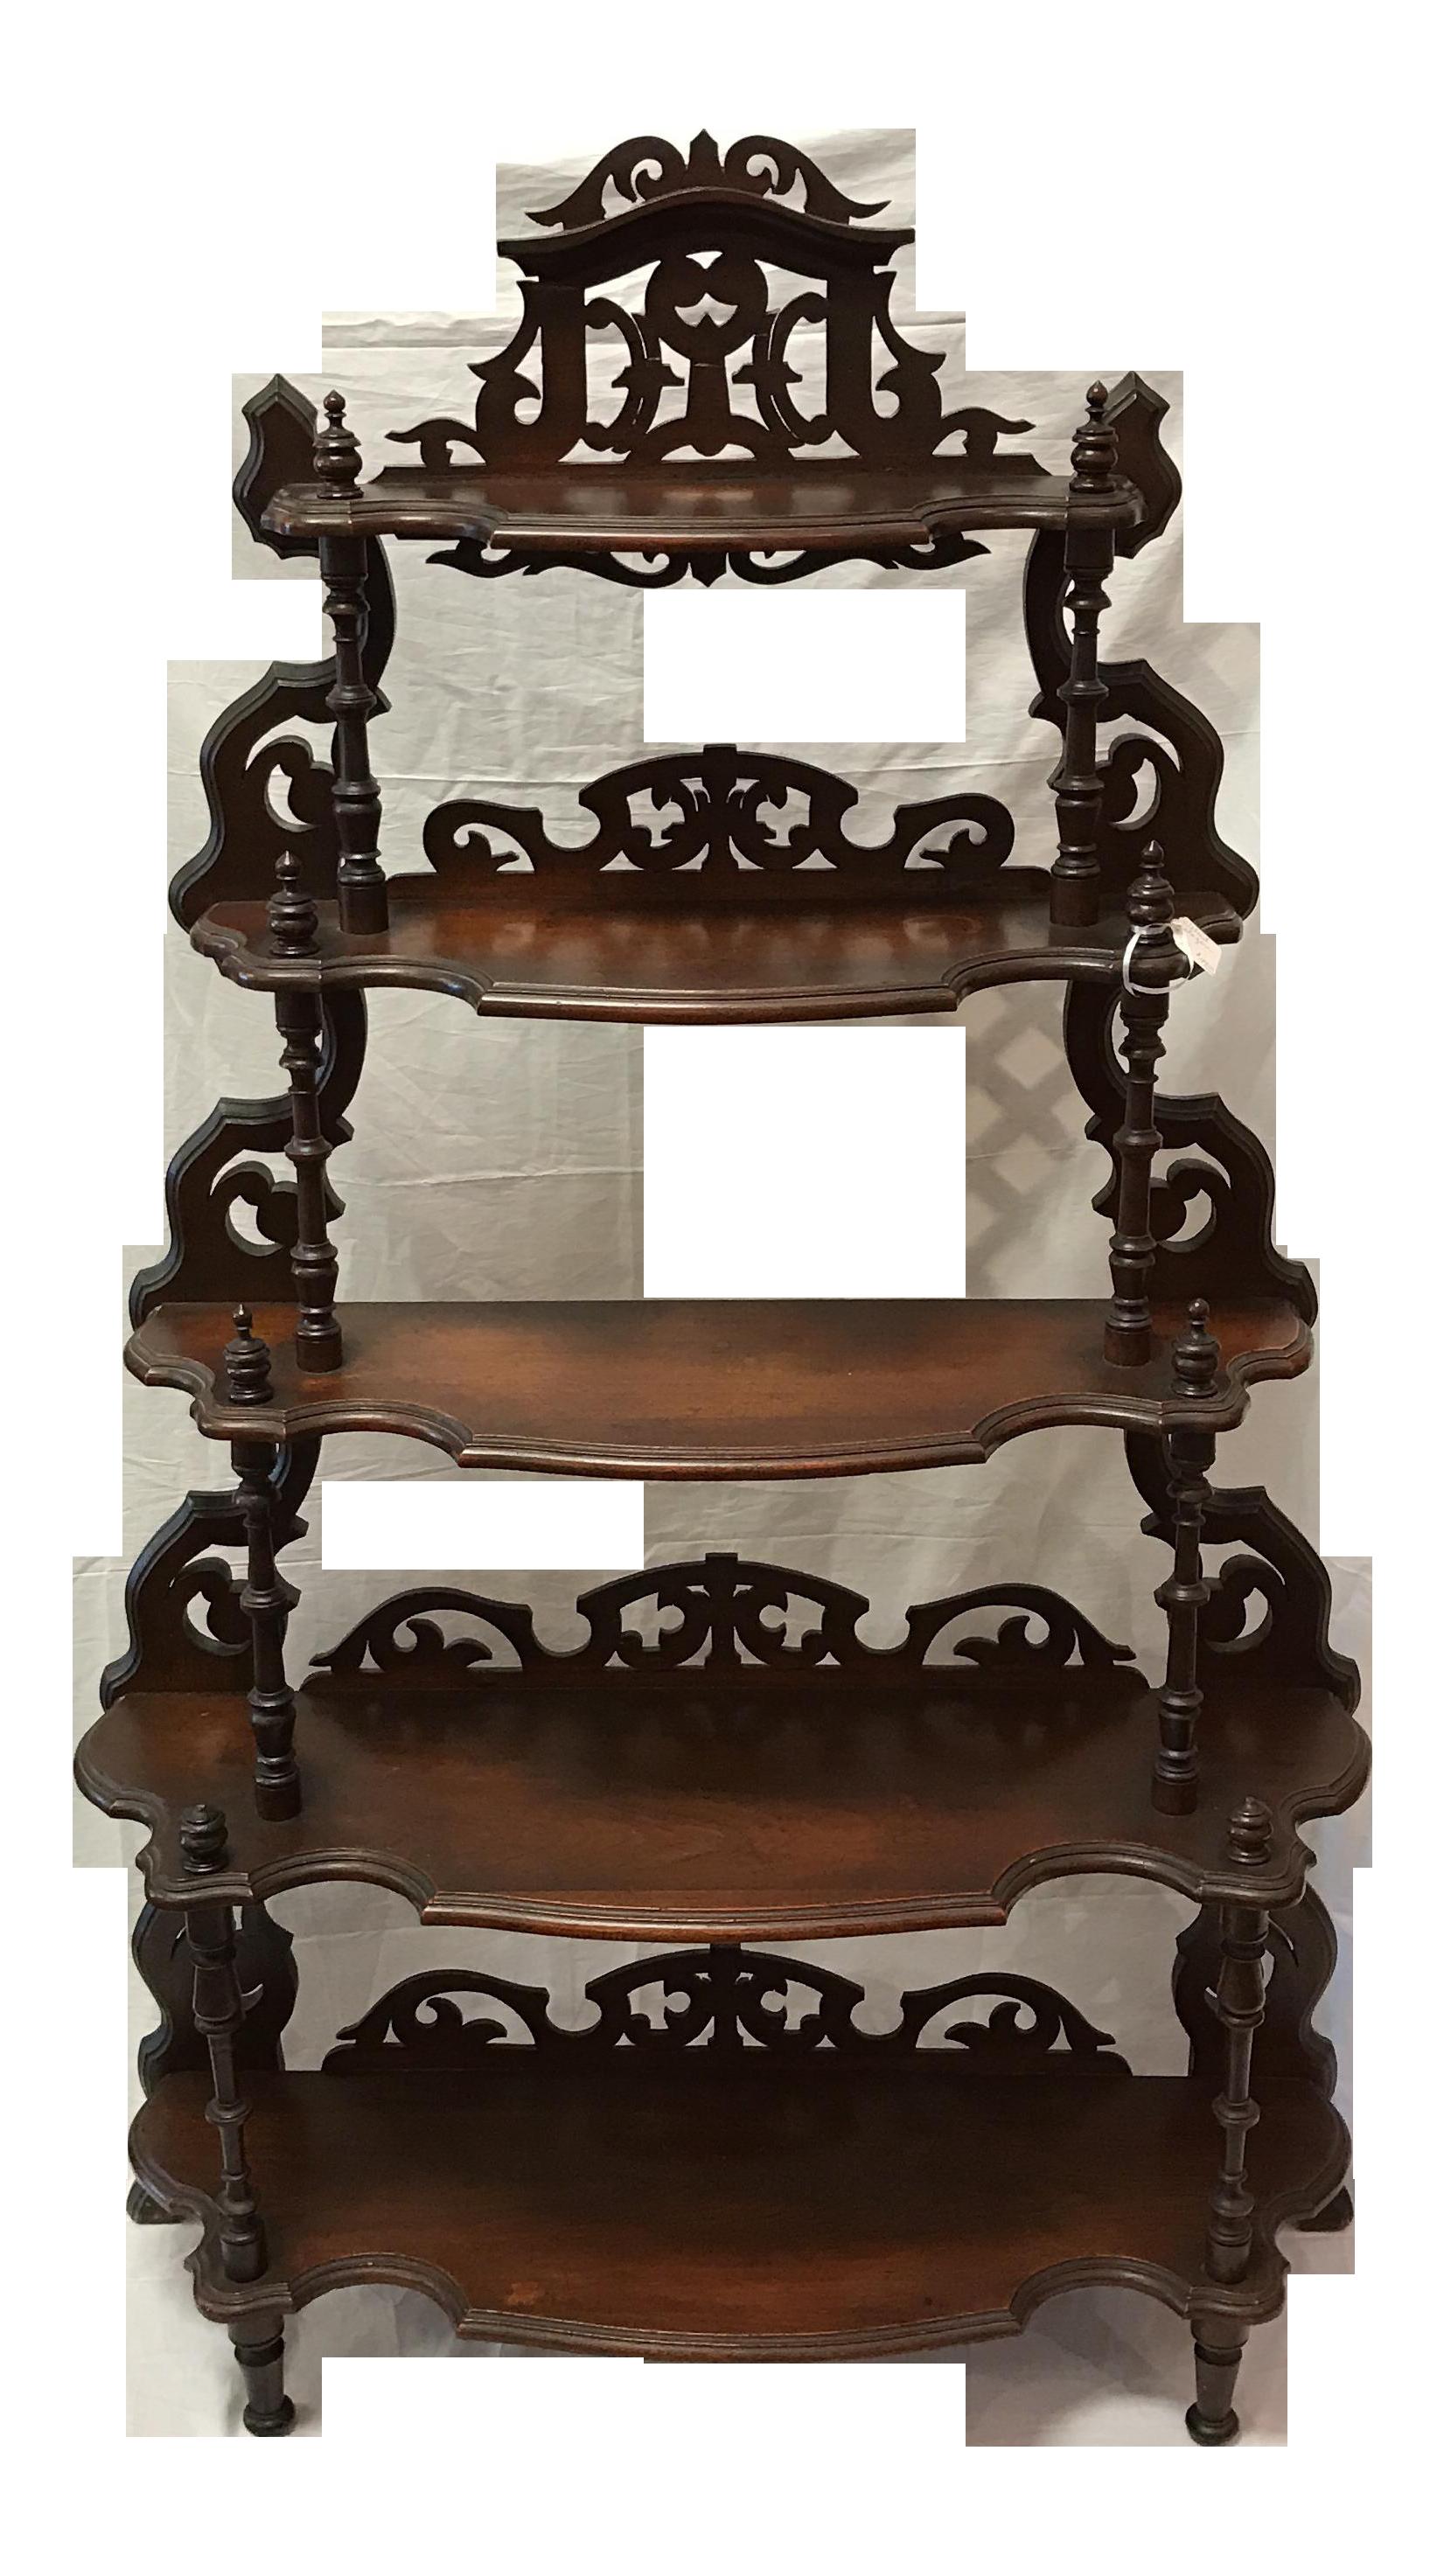 Antique walnut etagere display. Furniture clipart bookshelf